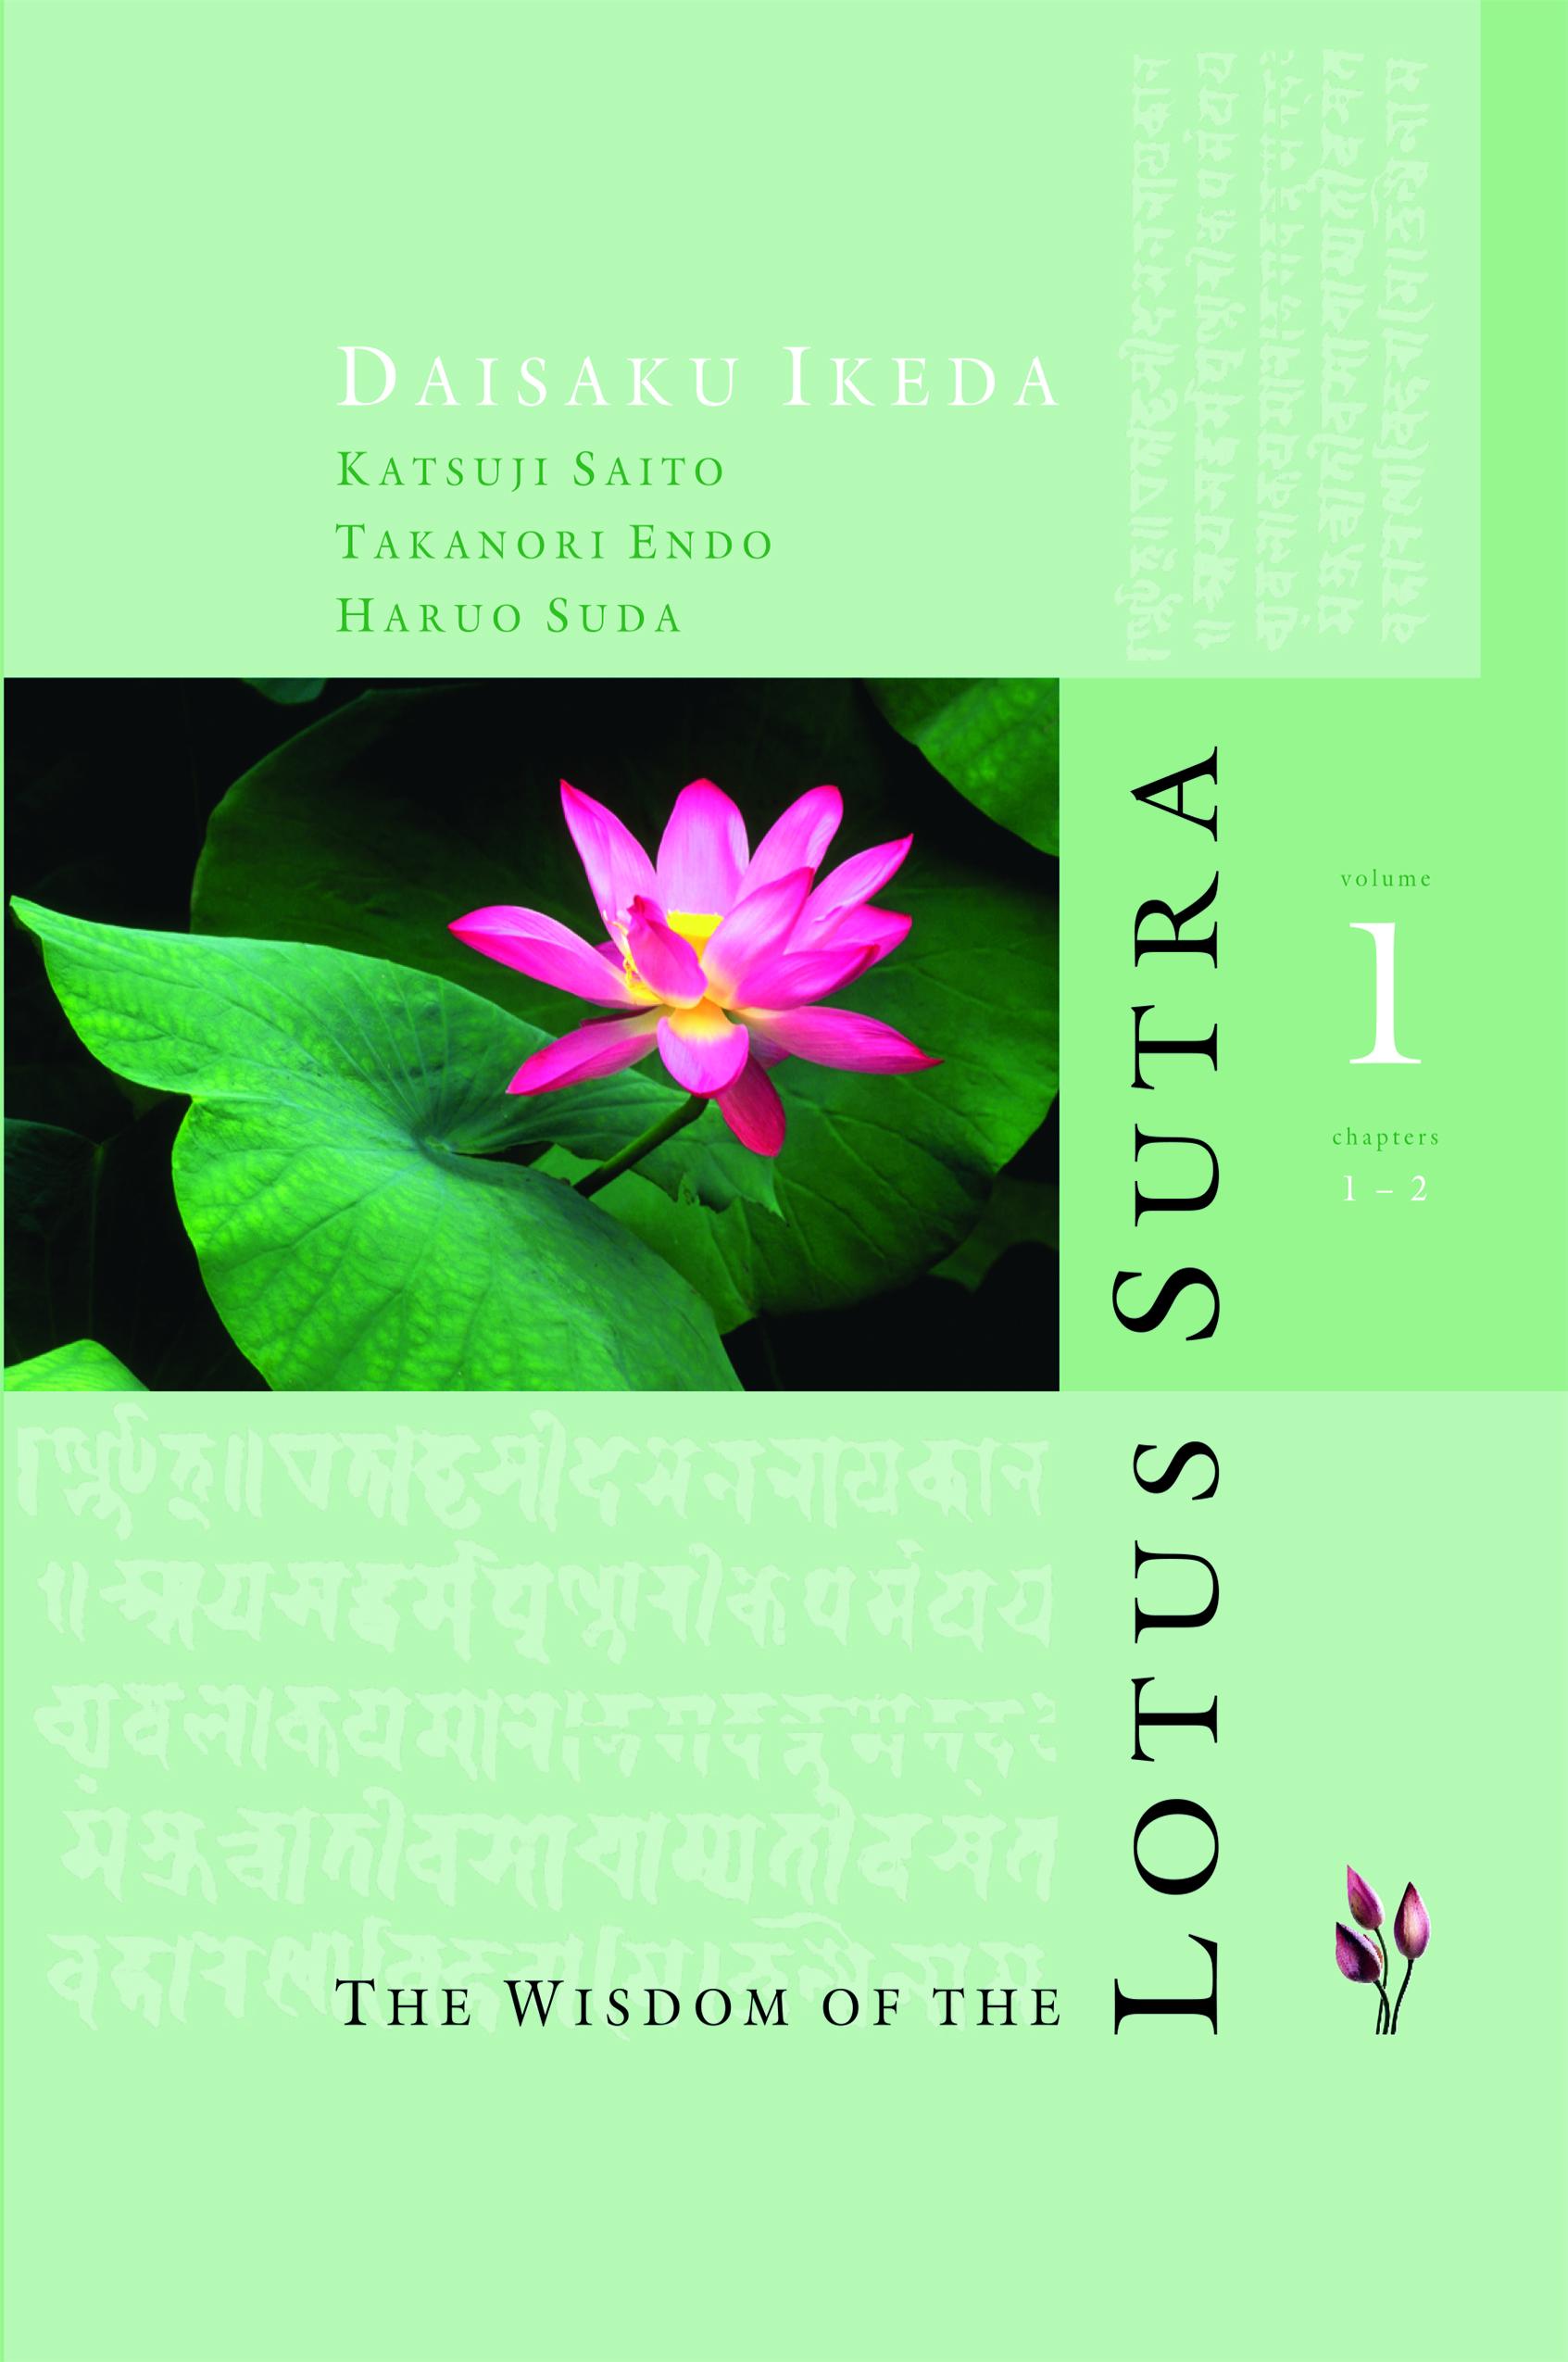 The wisdom of the lotus sutra vol 1 by daisaku ikeda eternal the wisdom of the lotus sutra vol 1 izmirmasajfo